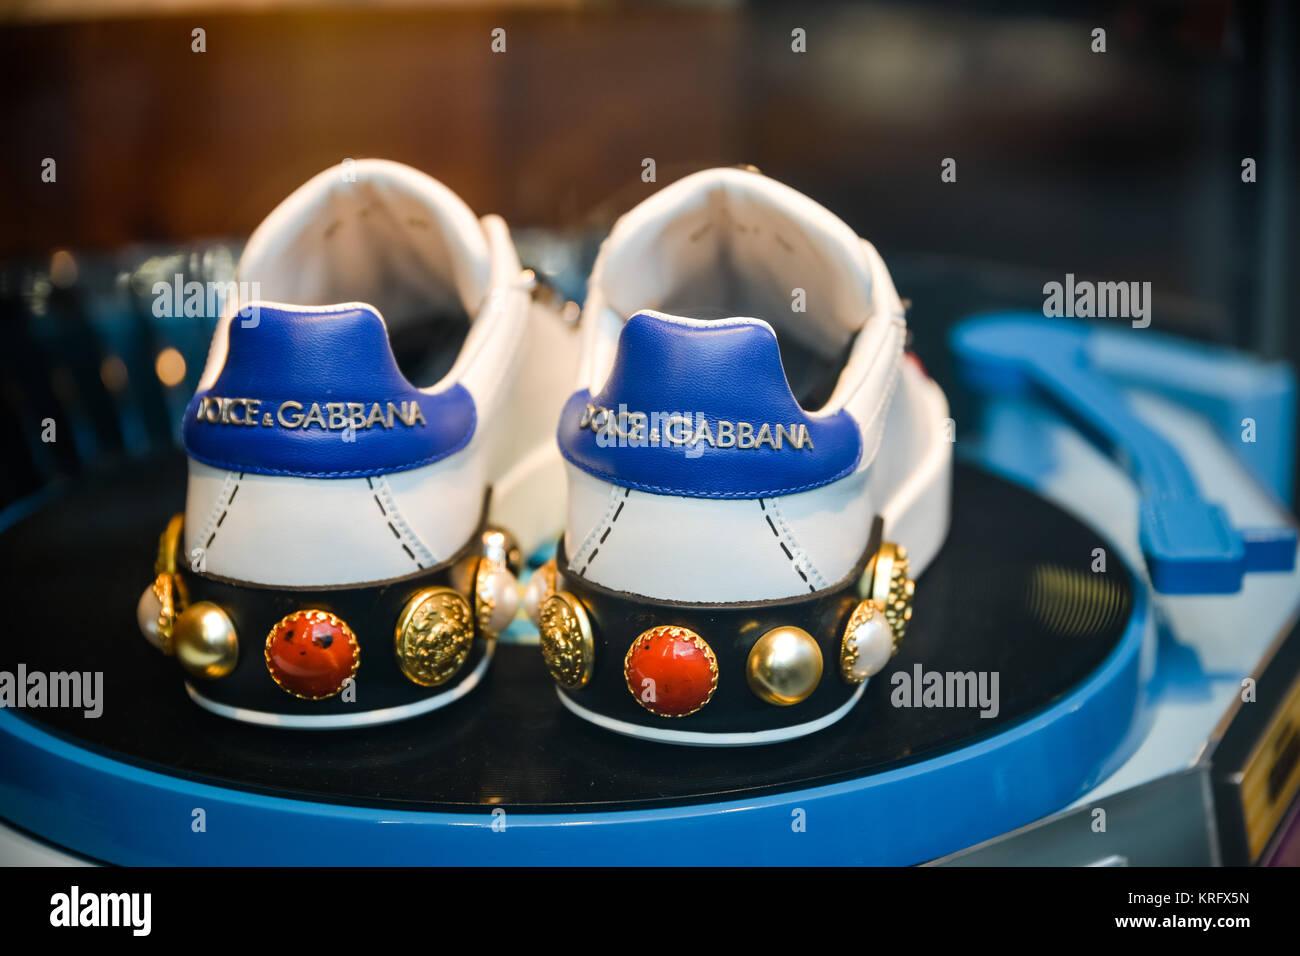 Milan, Italy - September 24, 2017:  Dolce Gabbana shoe in a DNG shop in Milan. - Stock Image